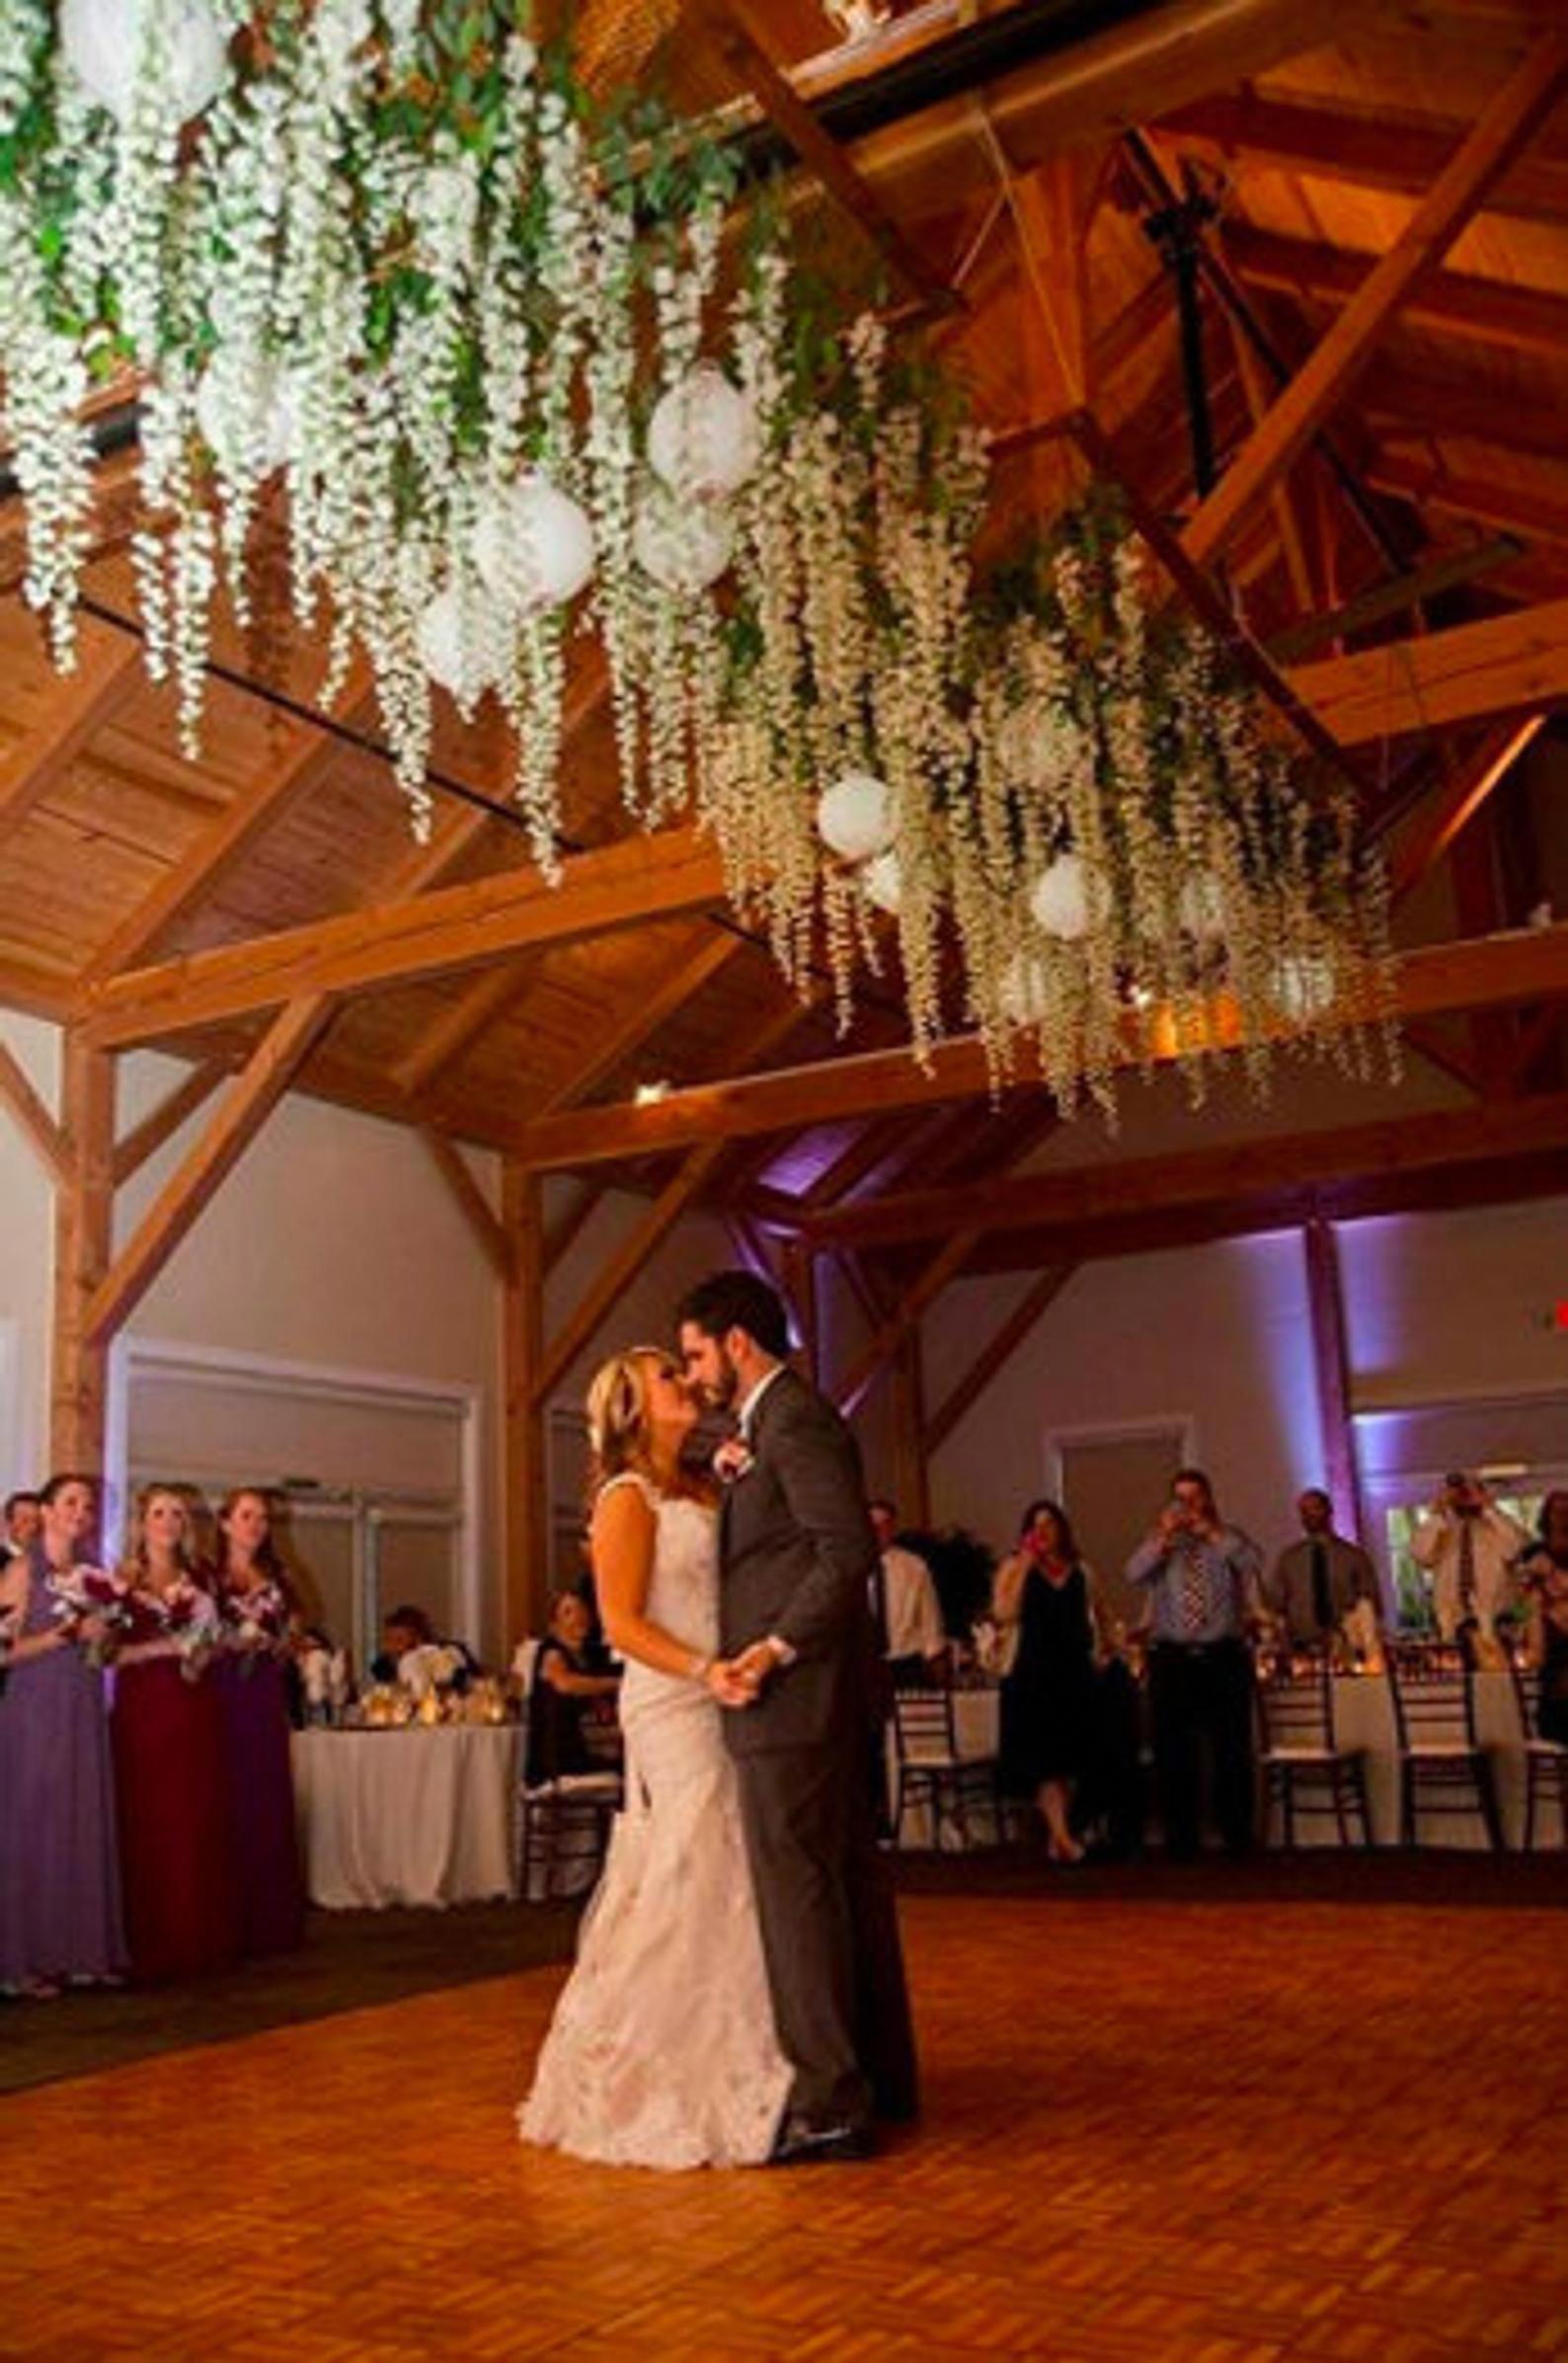 8pcs Each 3 6ft White Artificial Wisteria Vine Garland Silk Etsy In 2020 Hanging Flowers Wedding Garden Wedding Decorations Wisteria Wedding